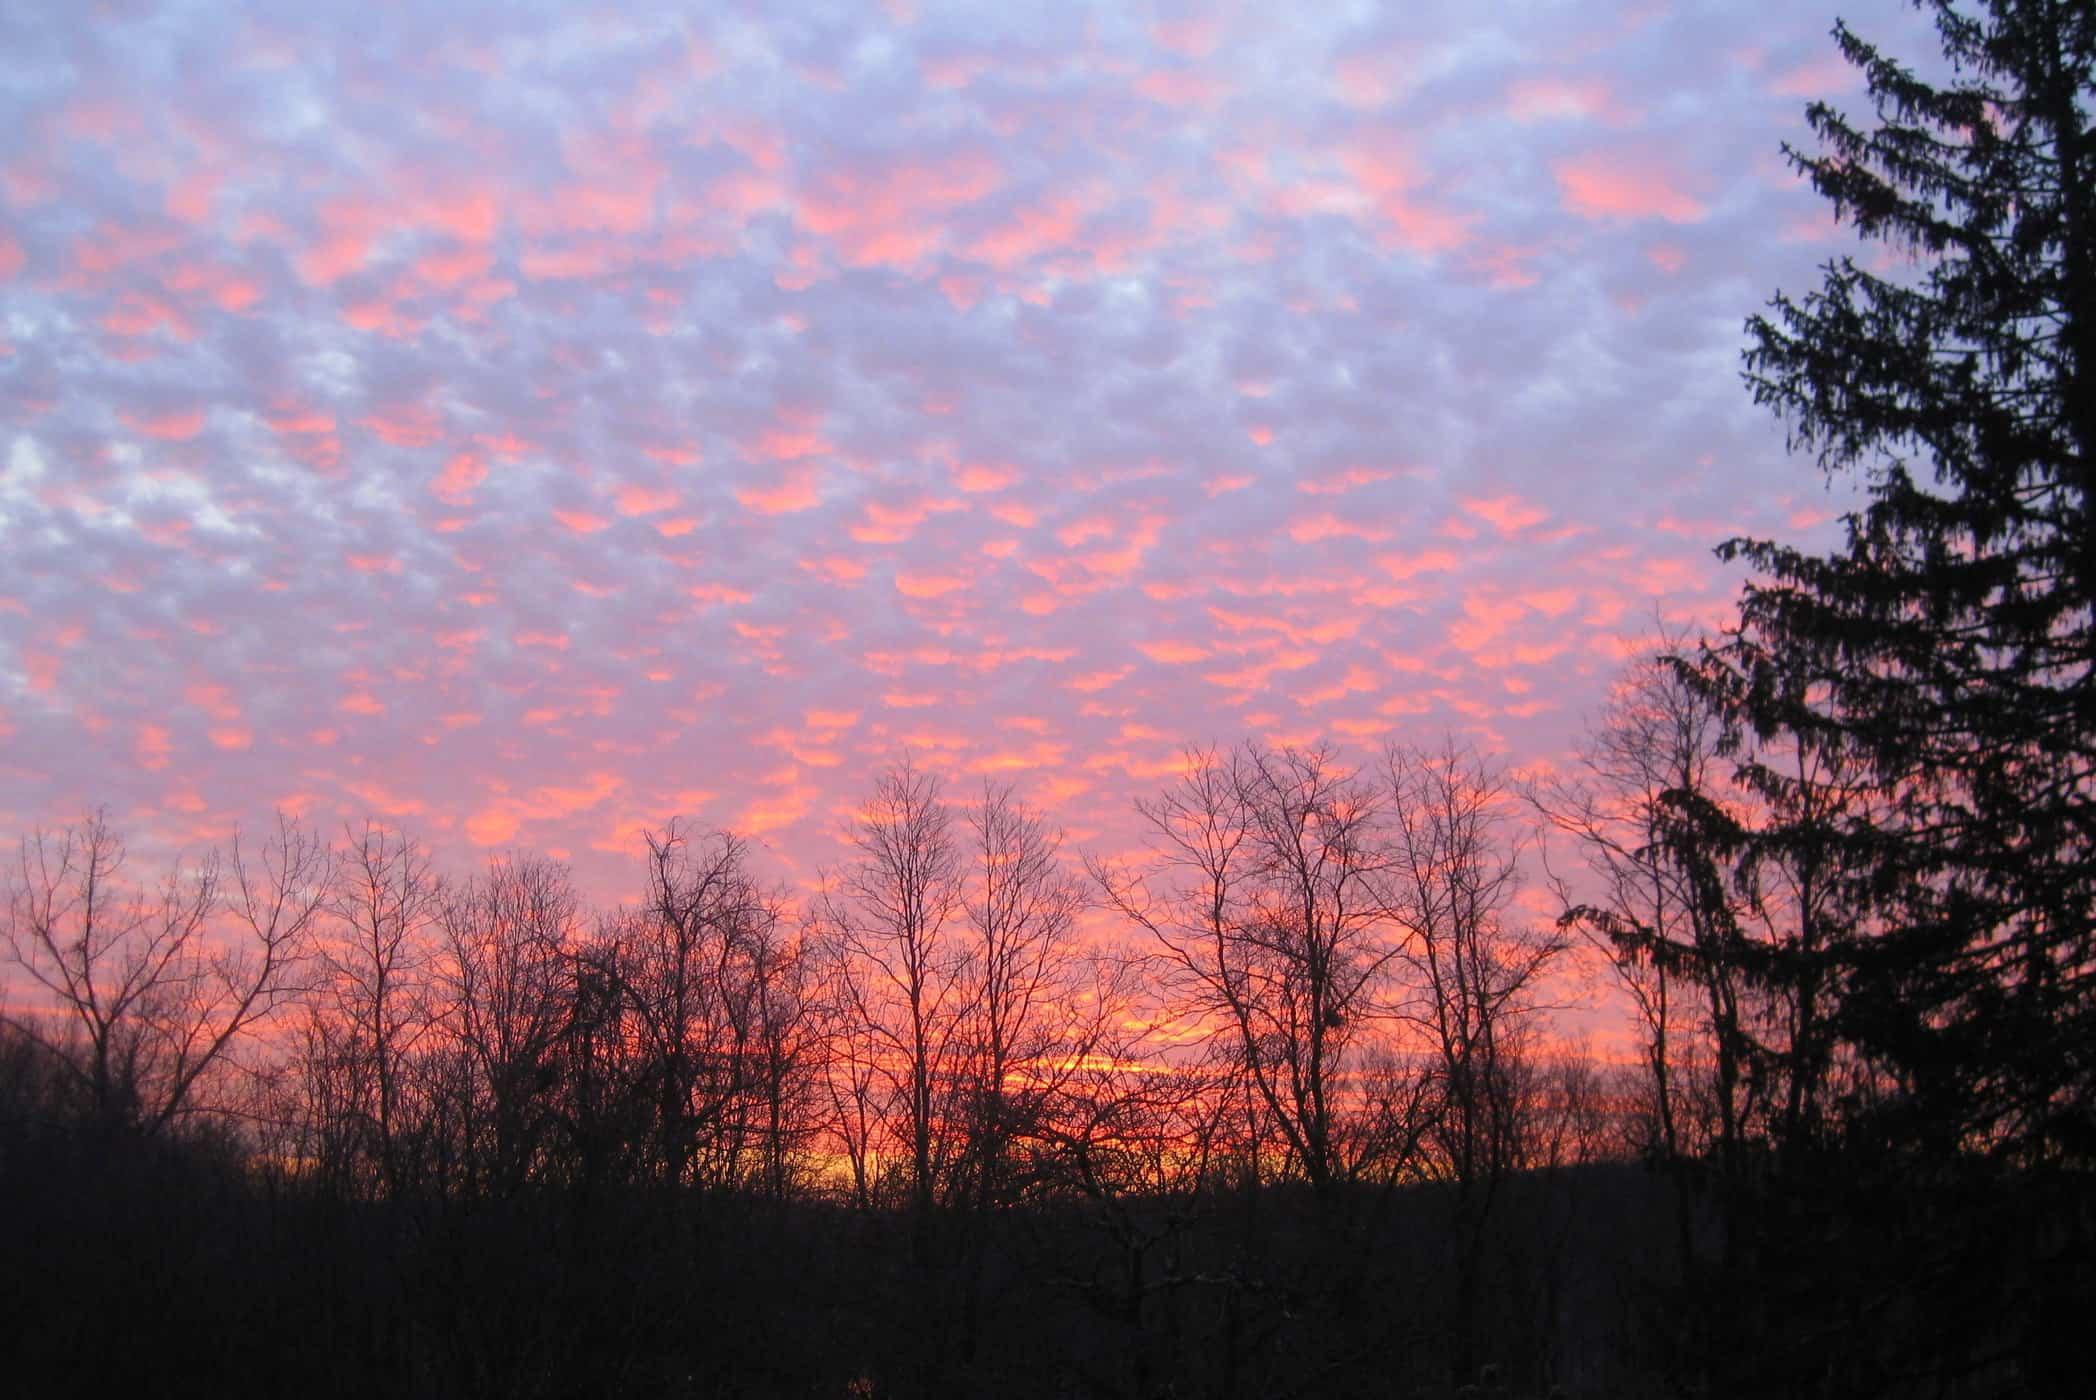 sunrise in Westchester, NY